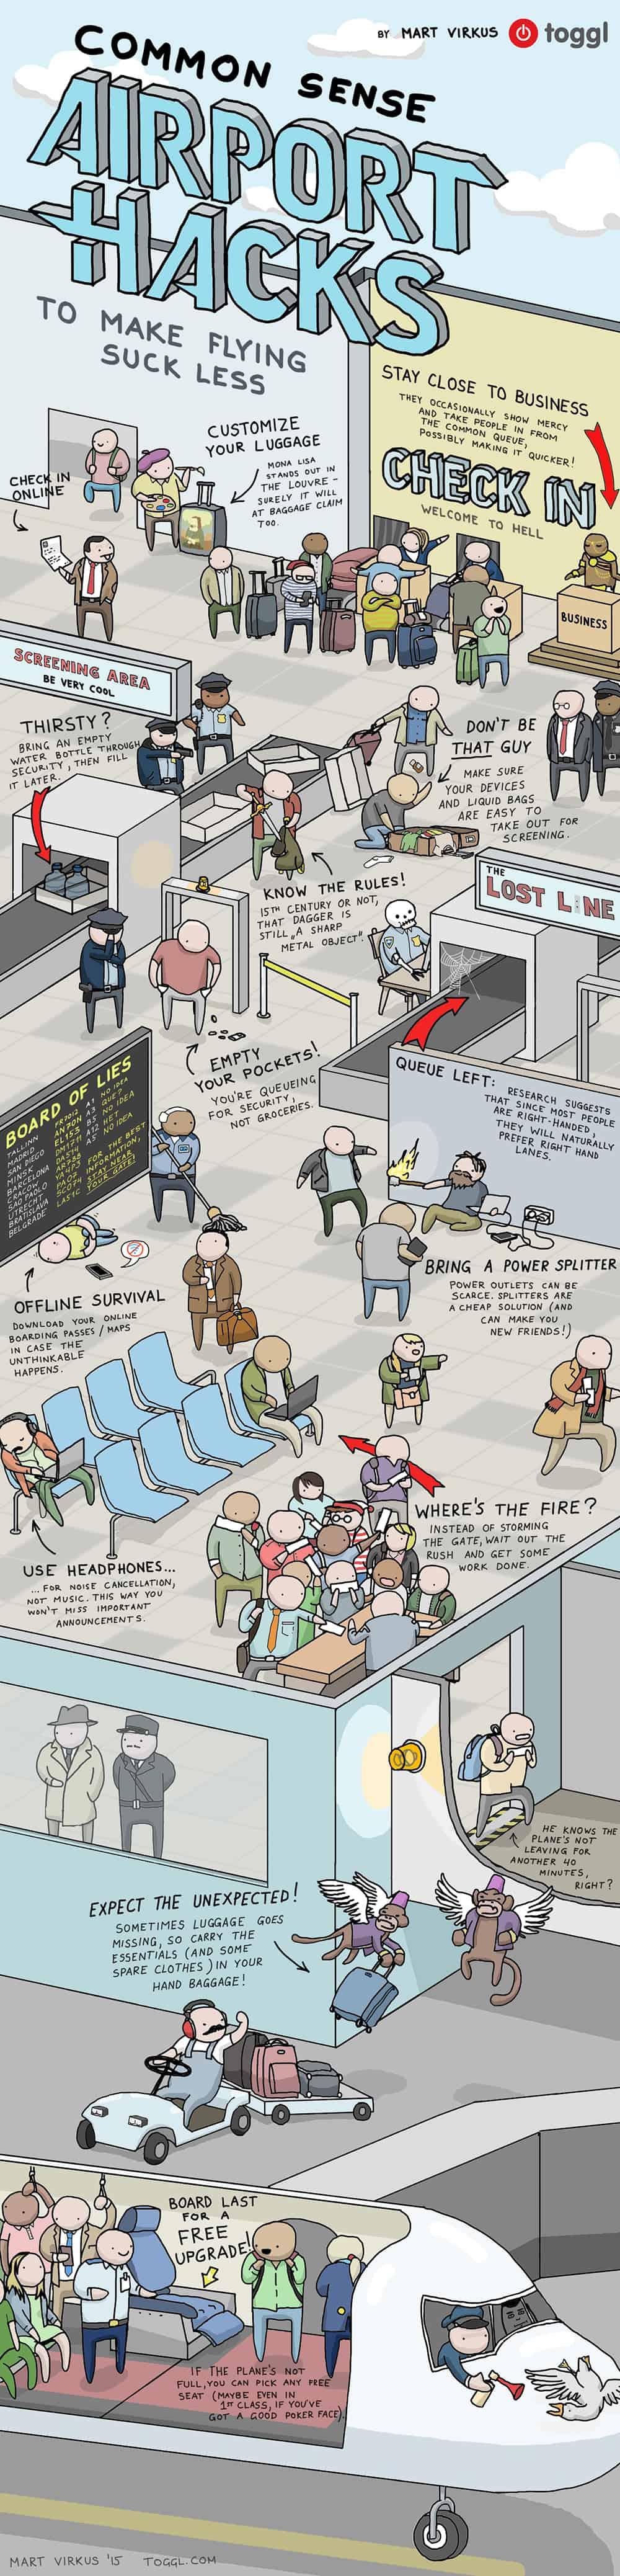 airport hacks infographic